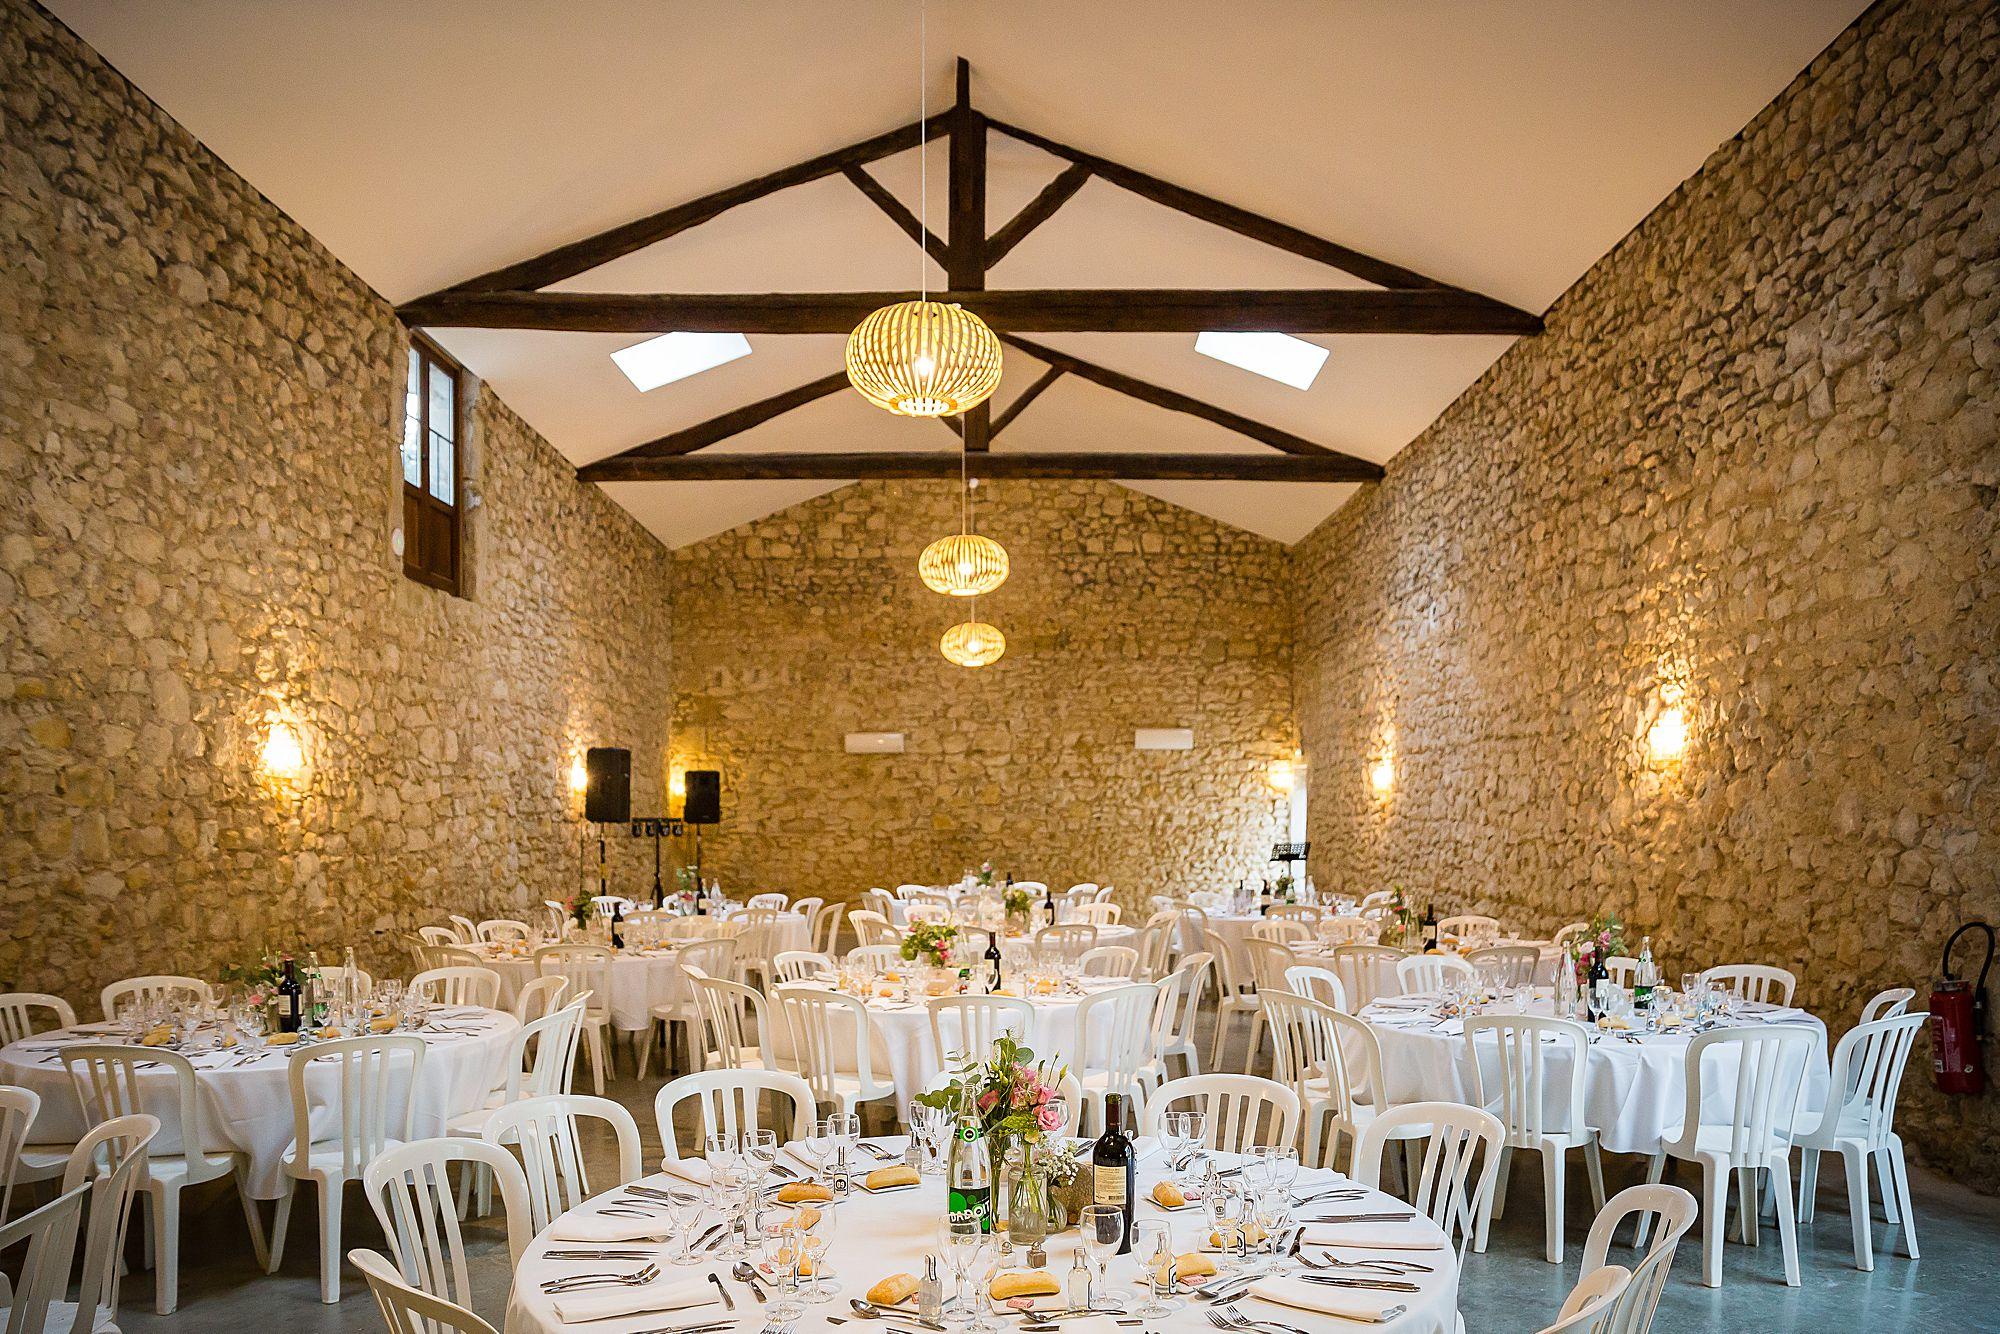 The salle Domaine de la Grangette wedding